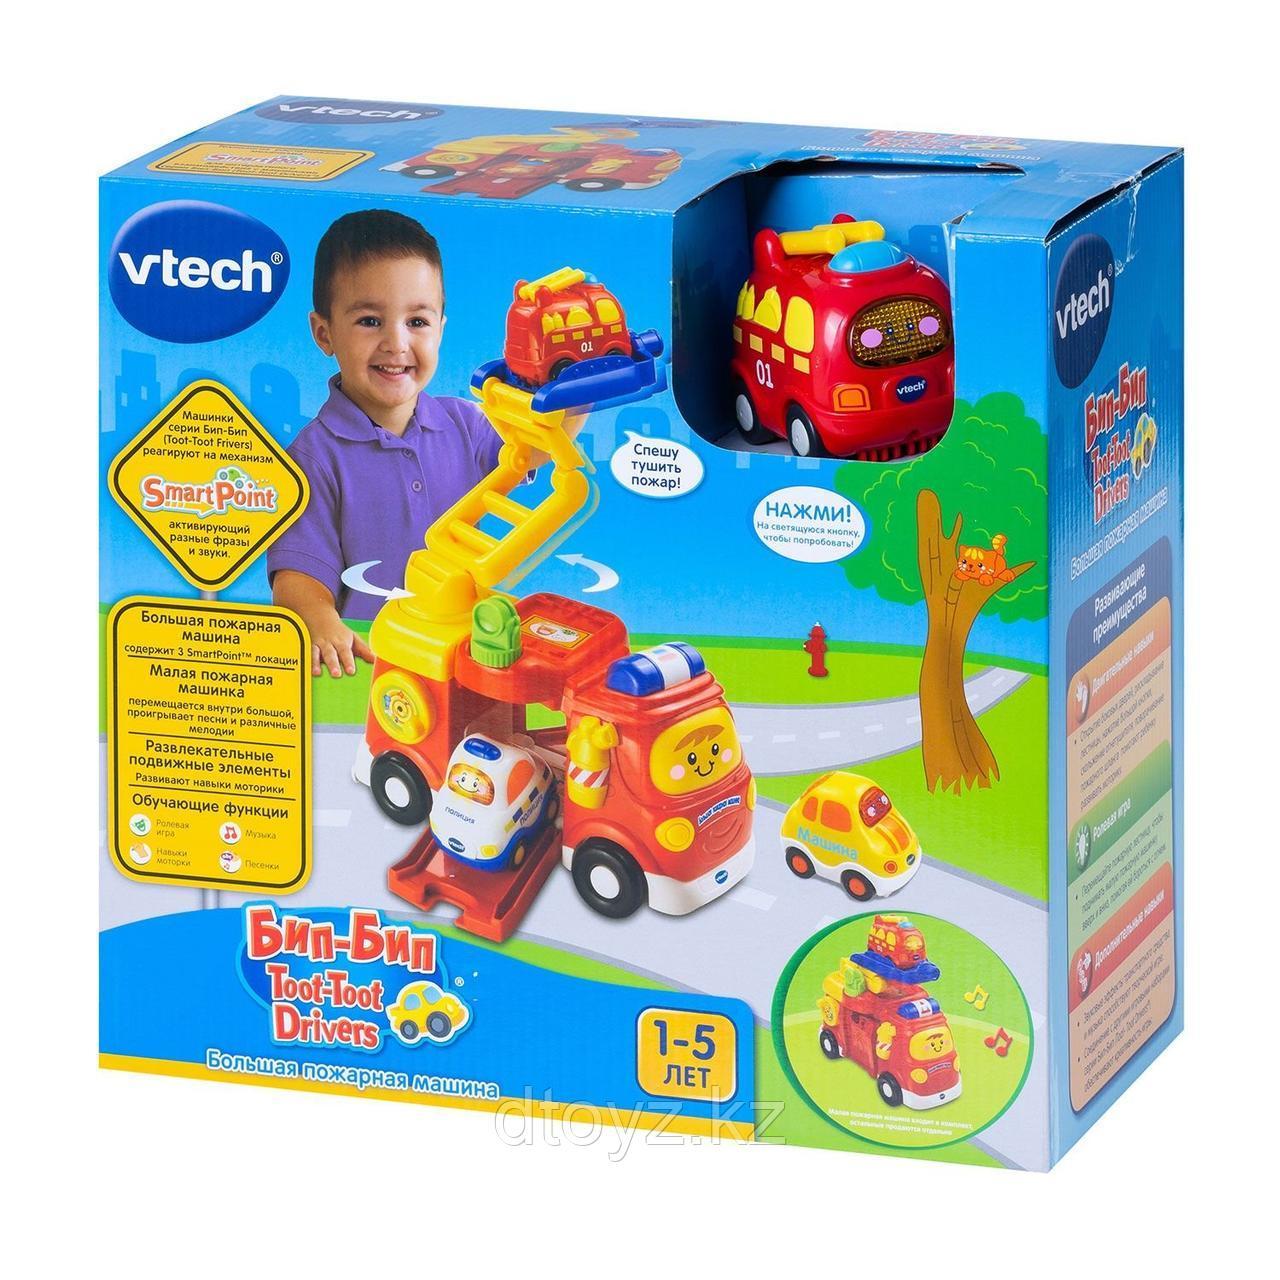 Vtech Пожарная машина Бип-Бип Toot-Toot Drivers большая 80-151326